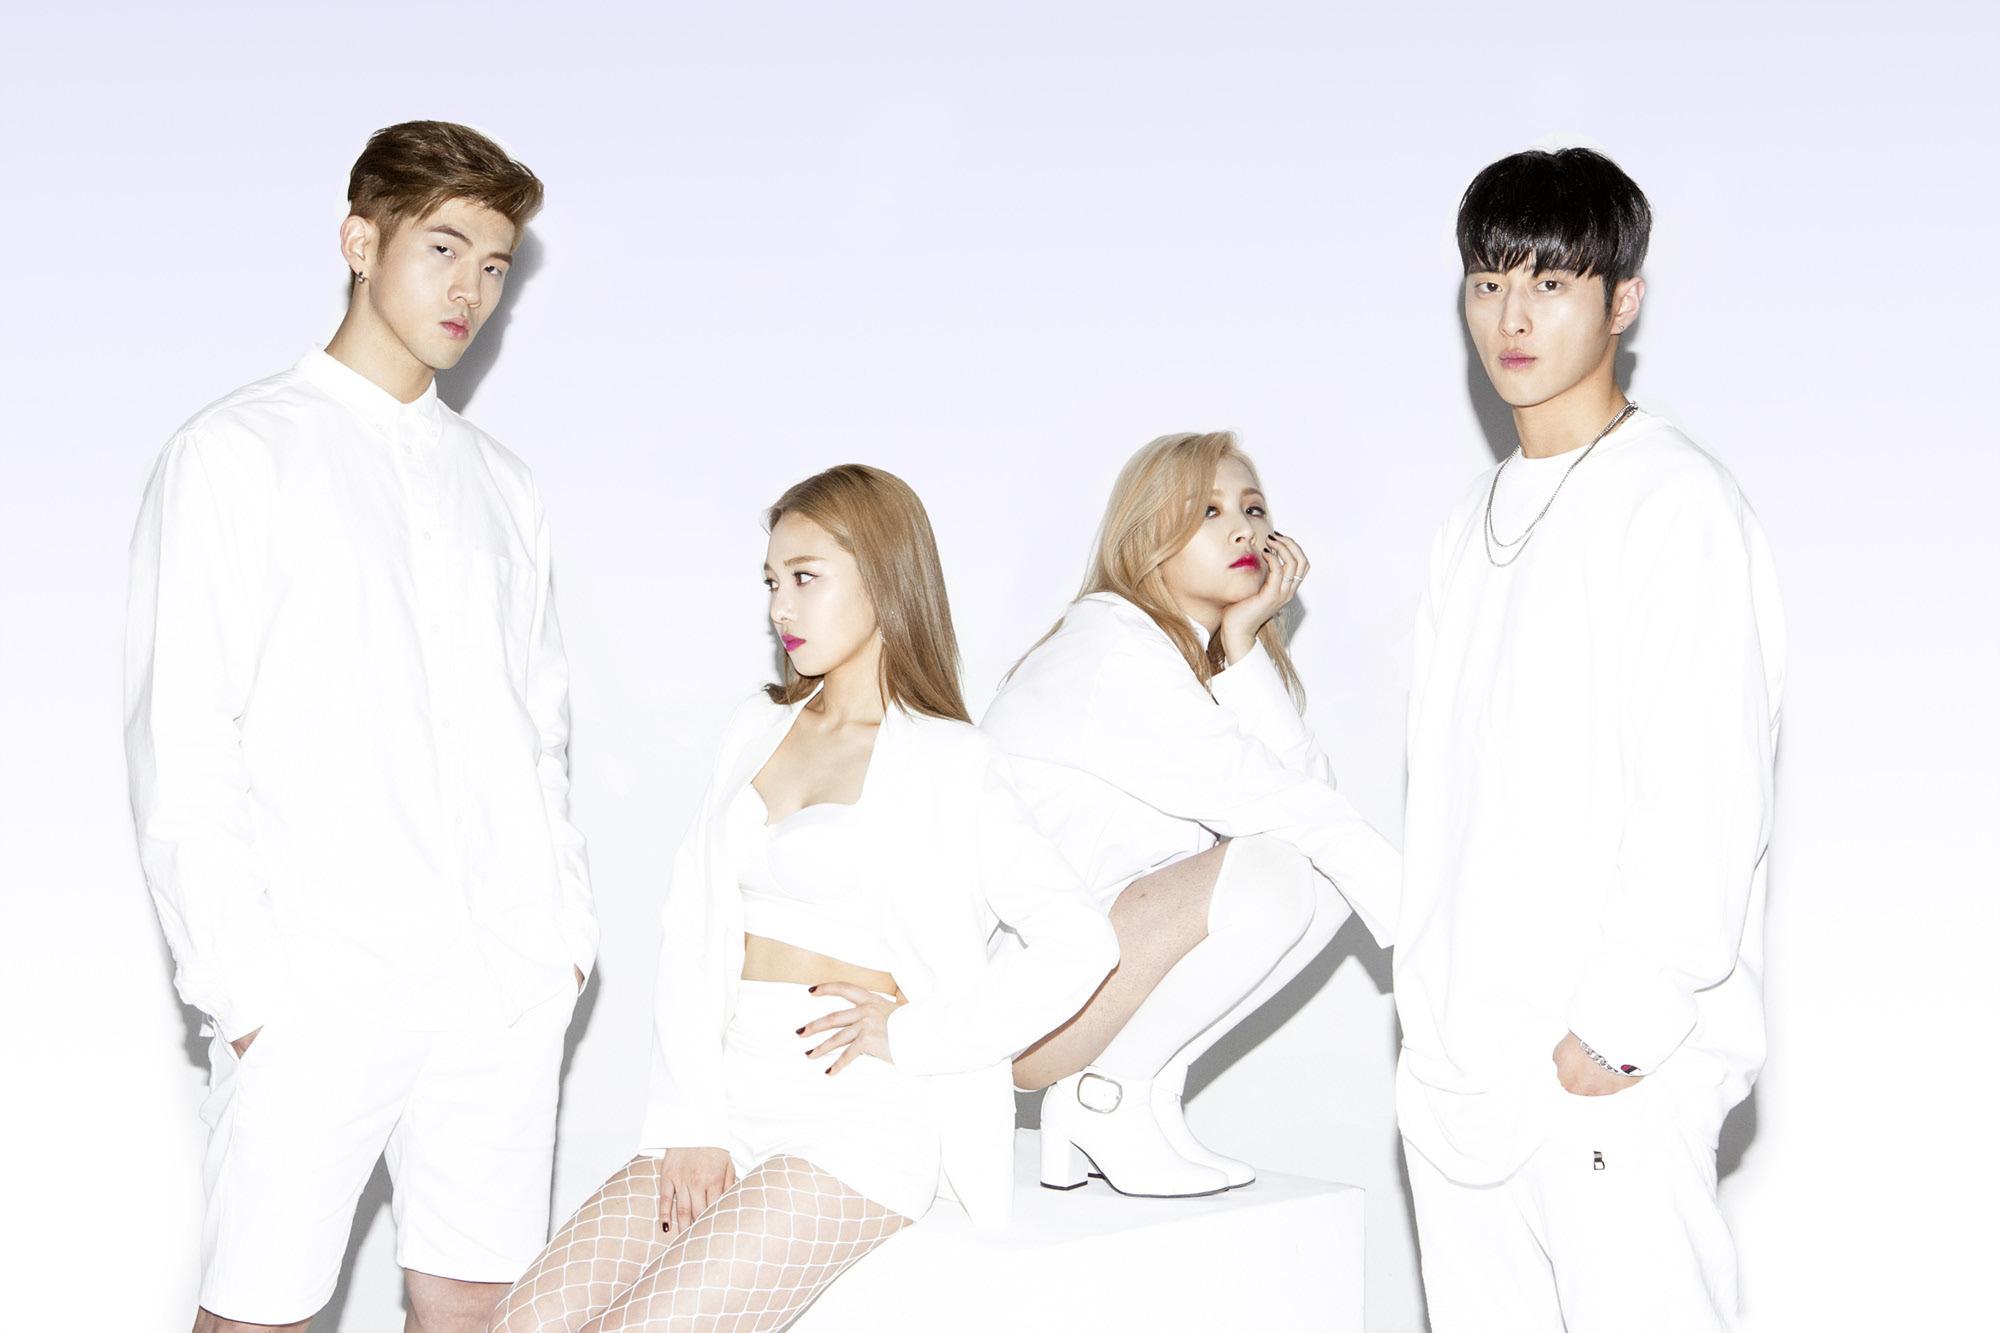 Kpop February 16